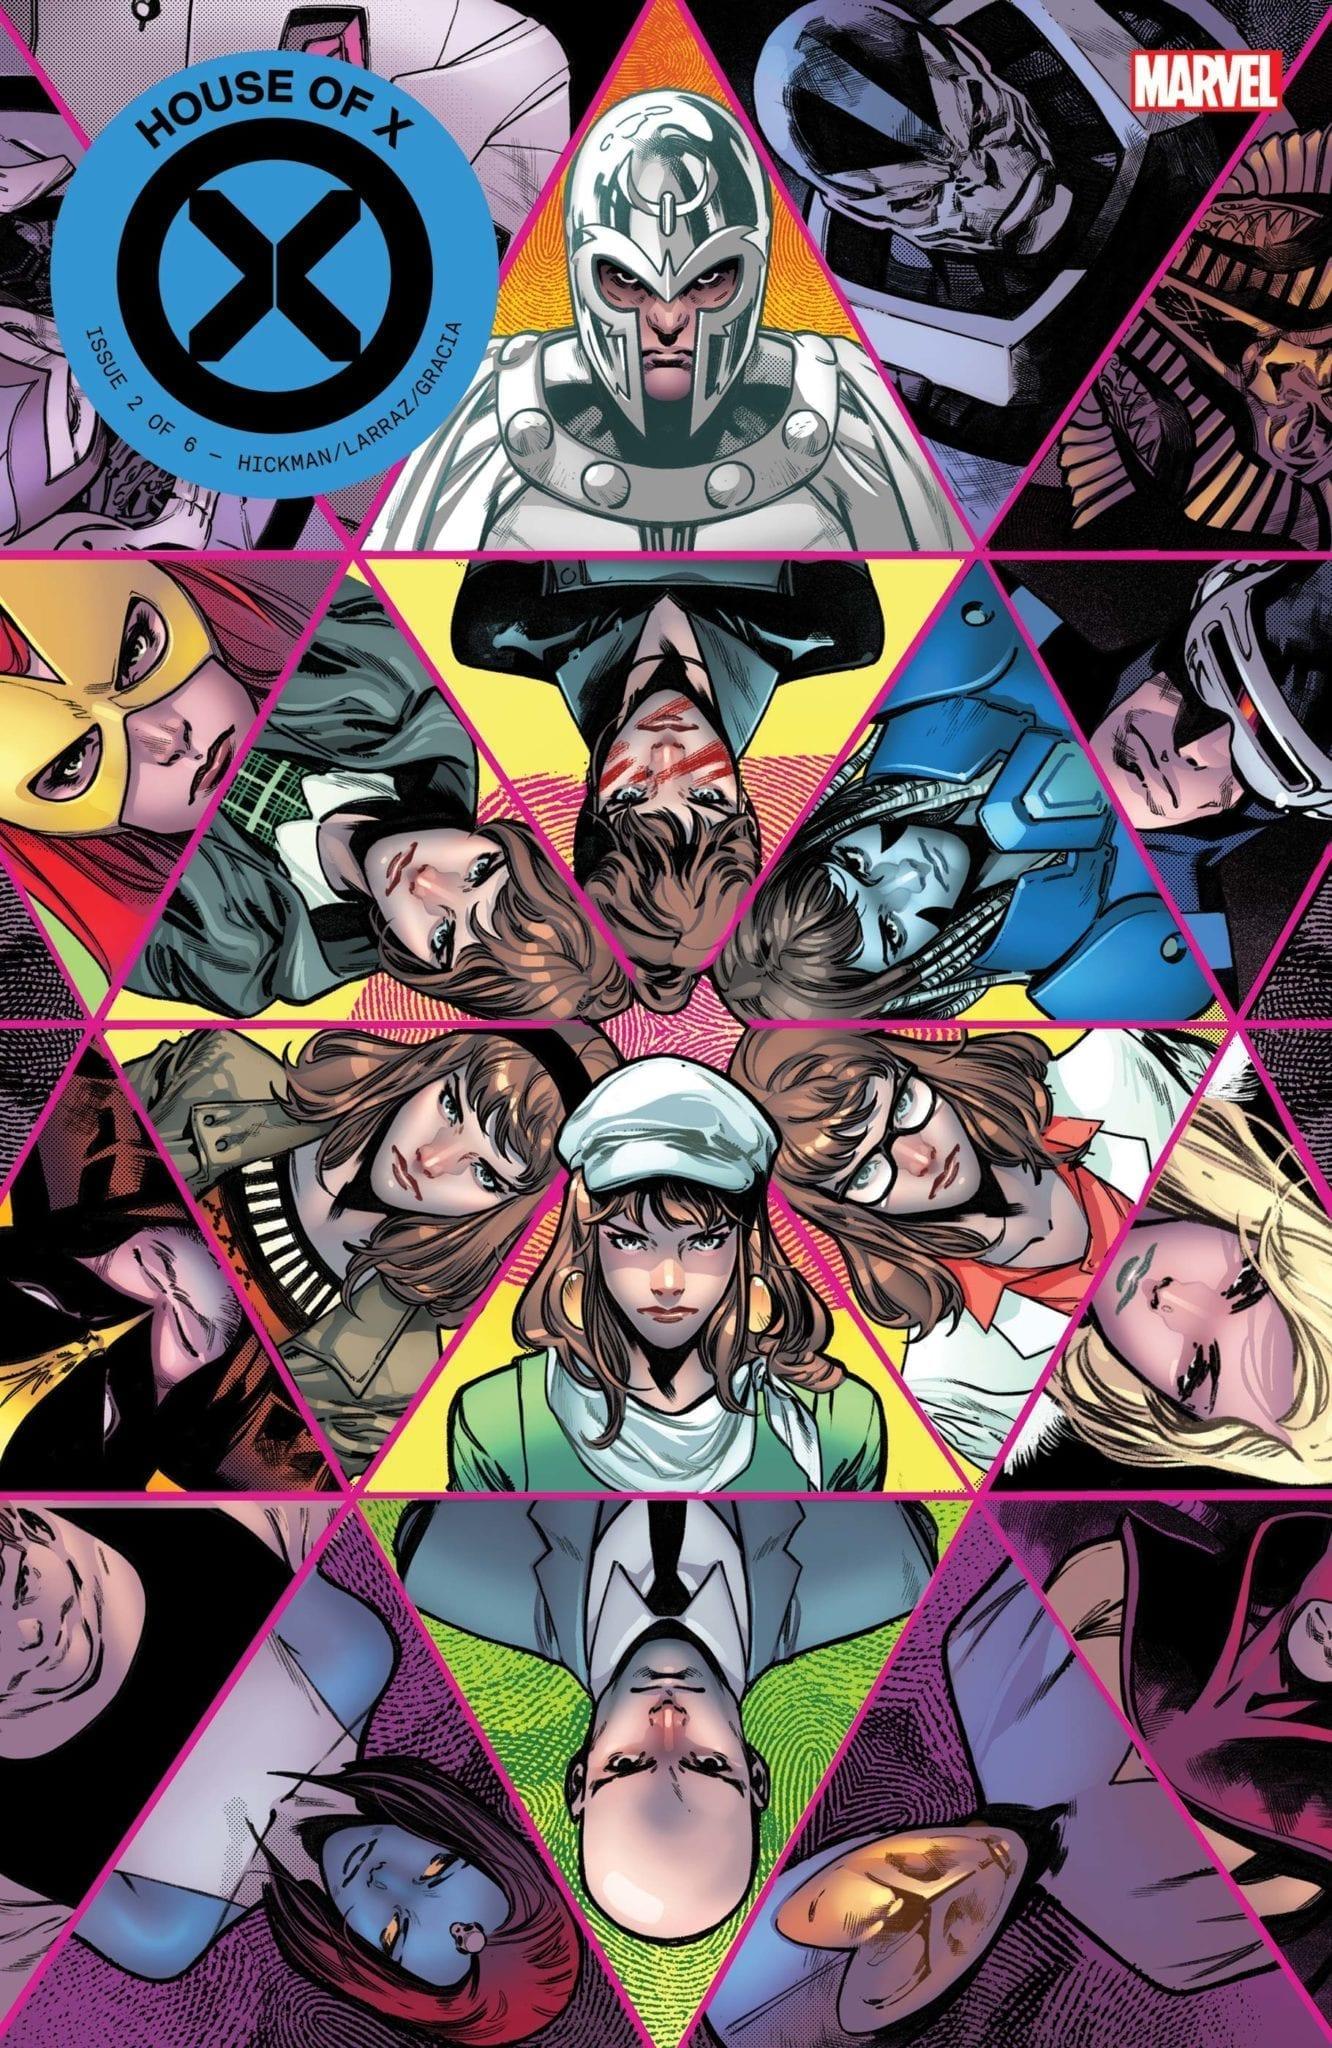 best comic books of 2019 marvel comics house of x